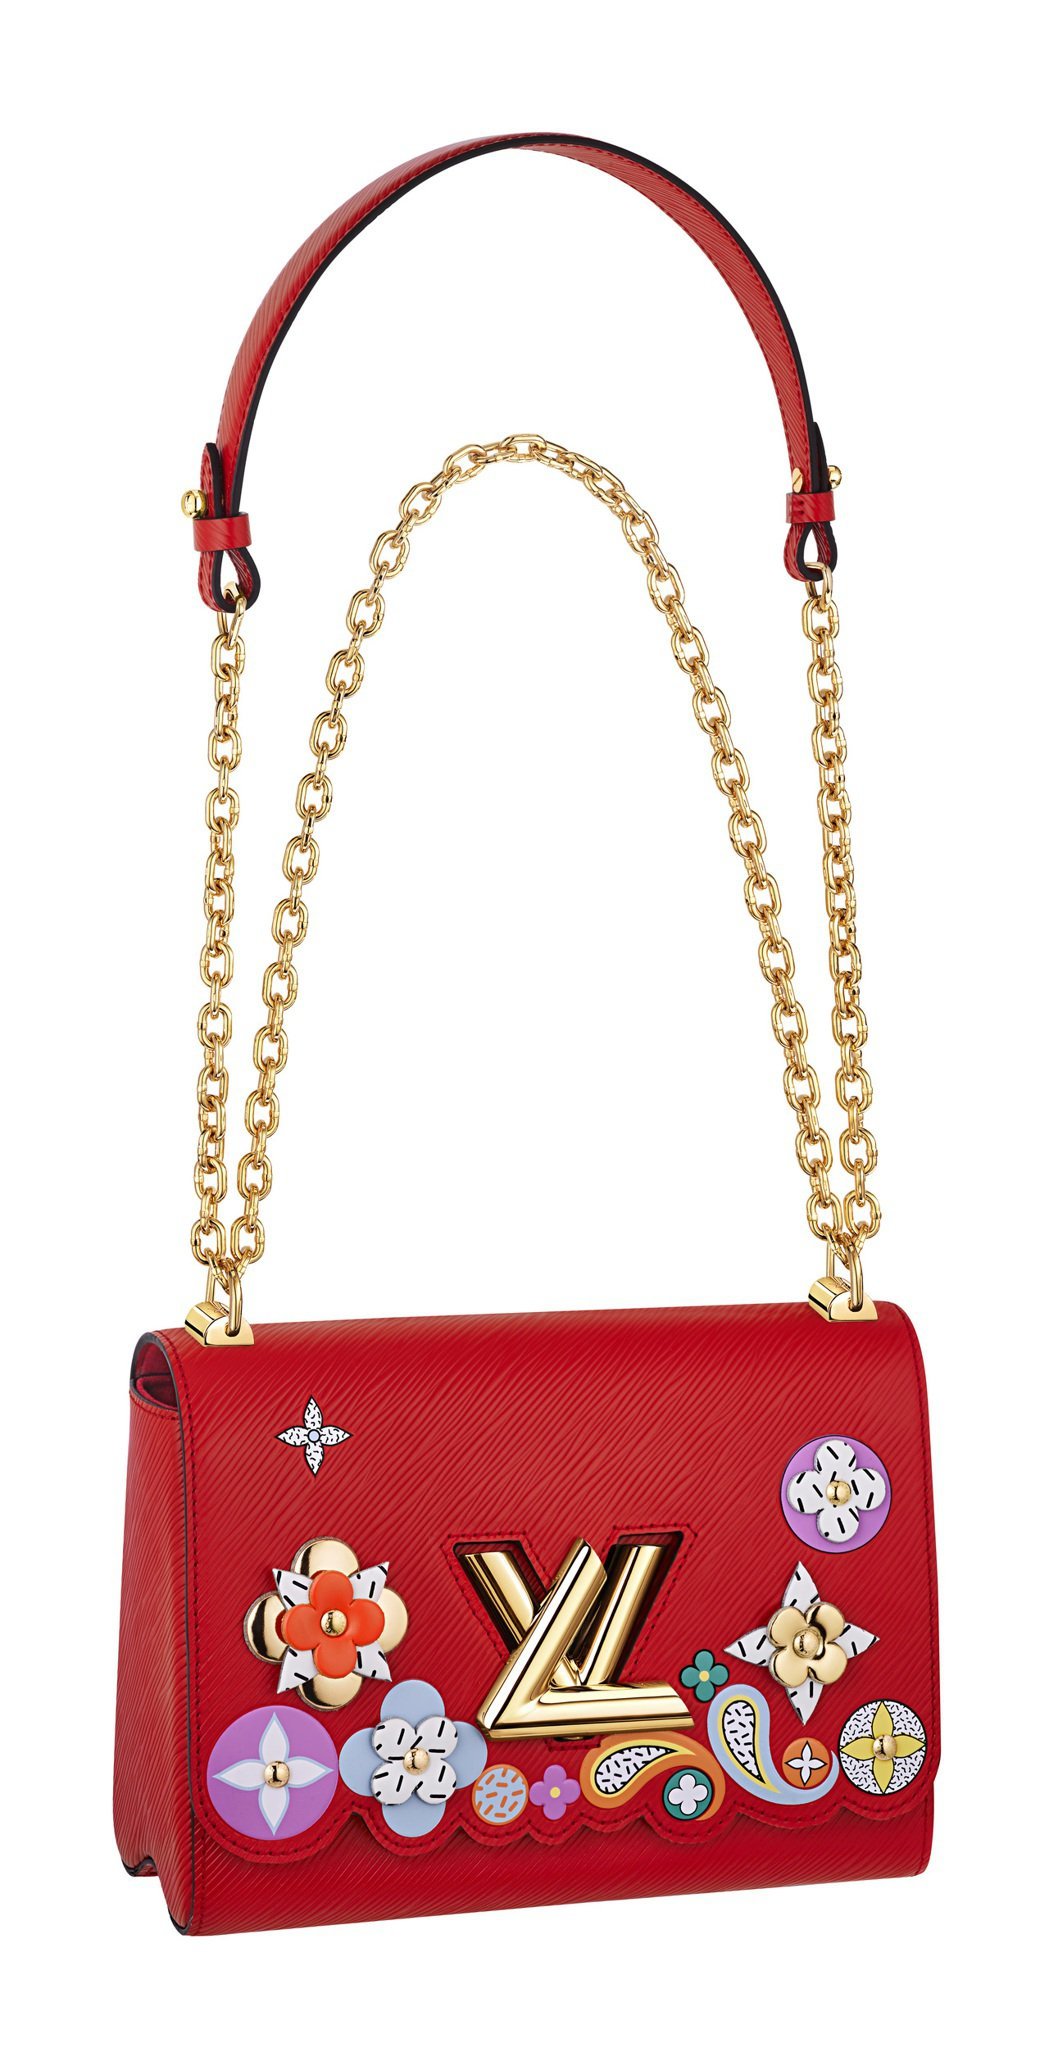 Twist包款系列仍是銷售常勝軍,立體皮革花飾是秋冬新款。圖/LV提供